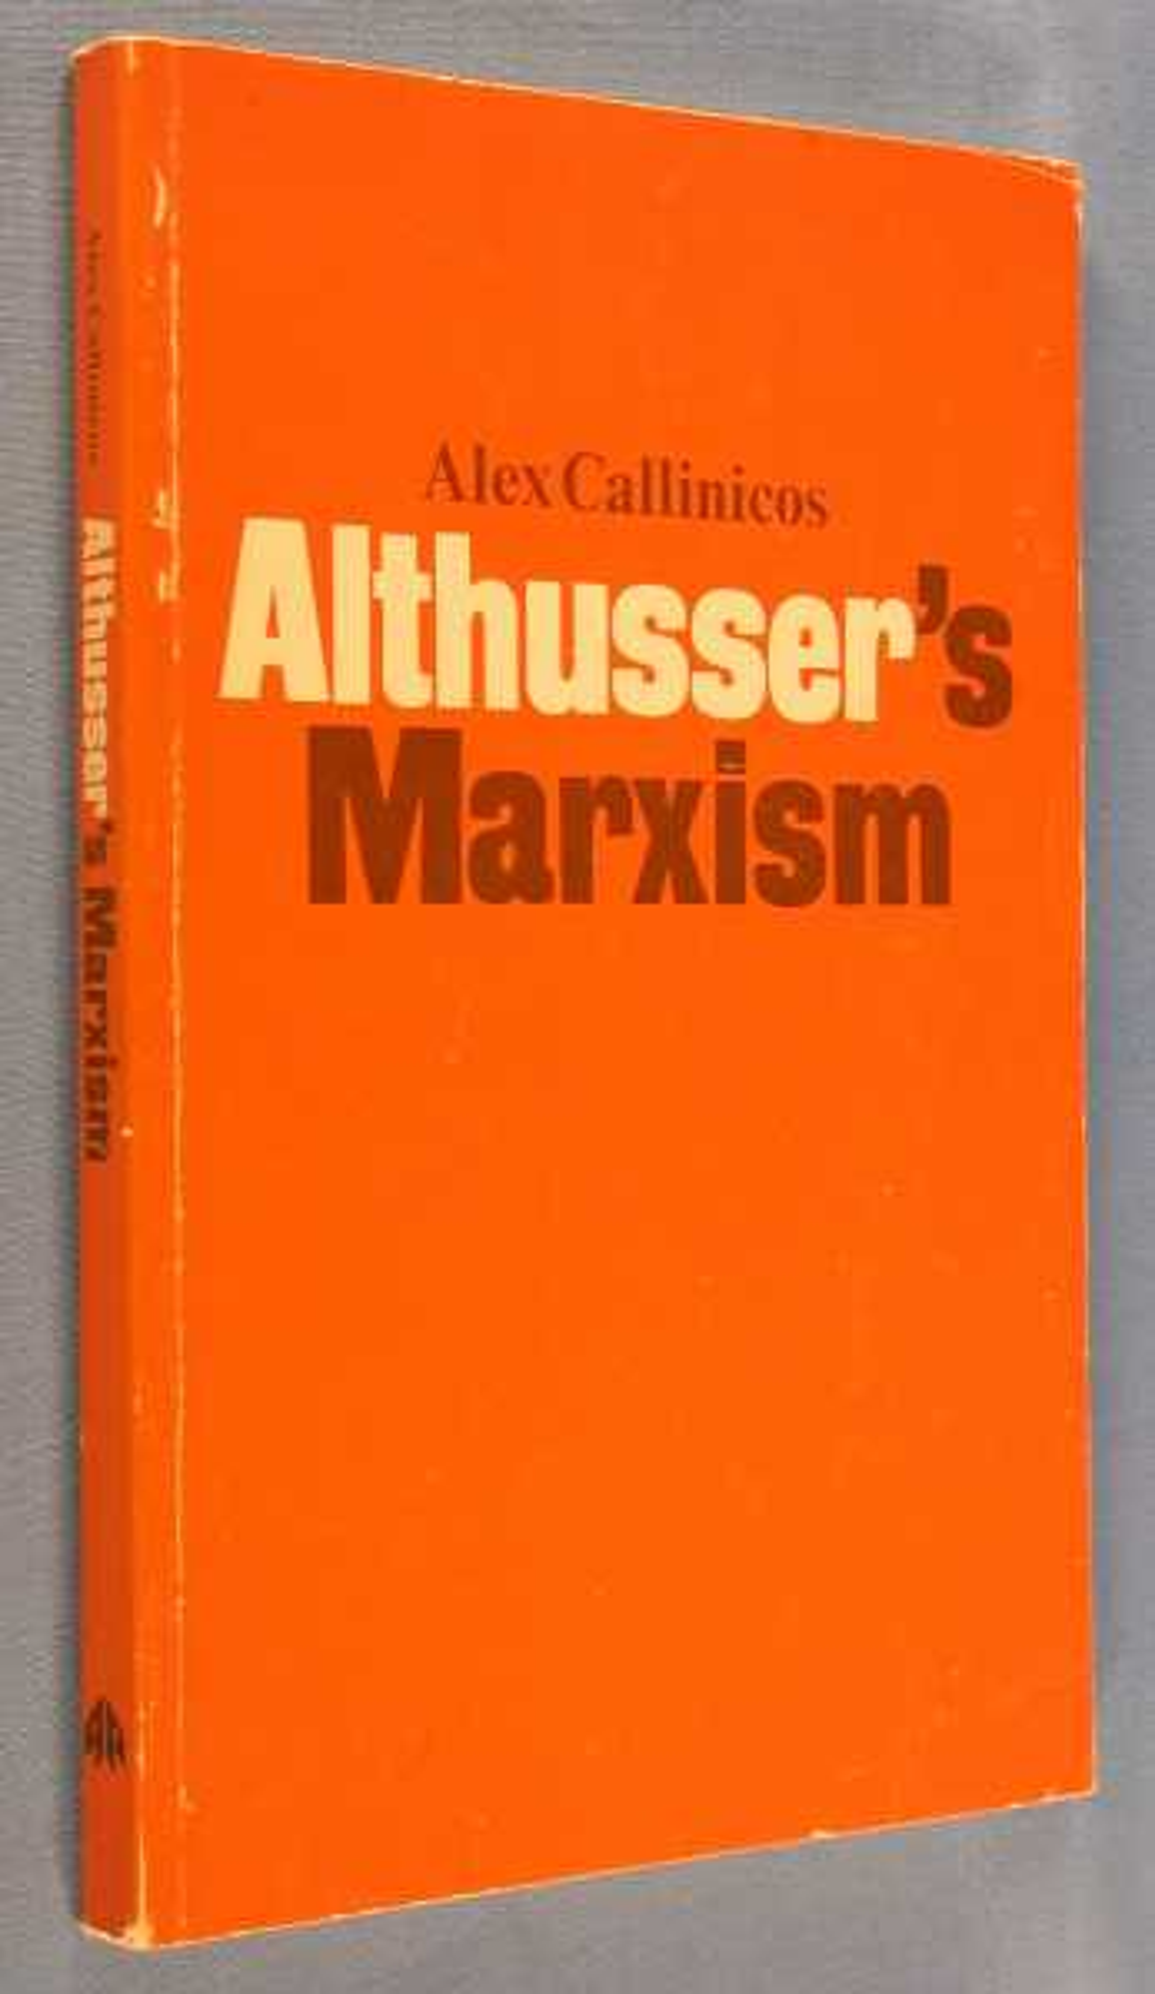 Althusser's Marxism, Callinicos, Alex